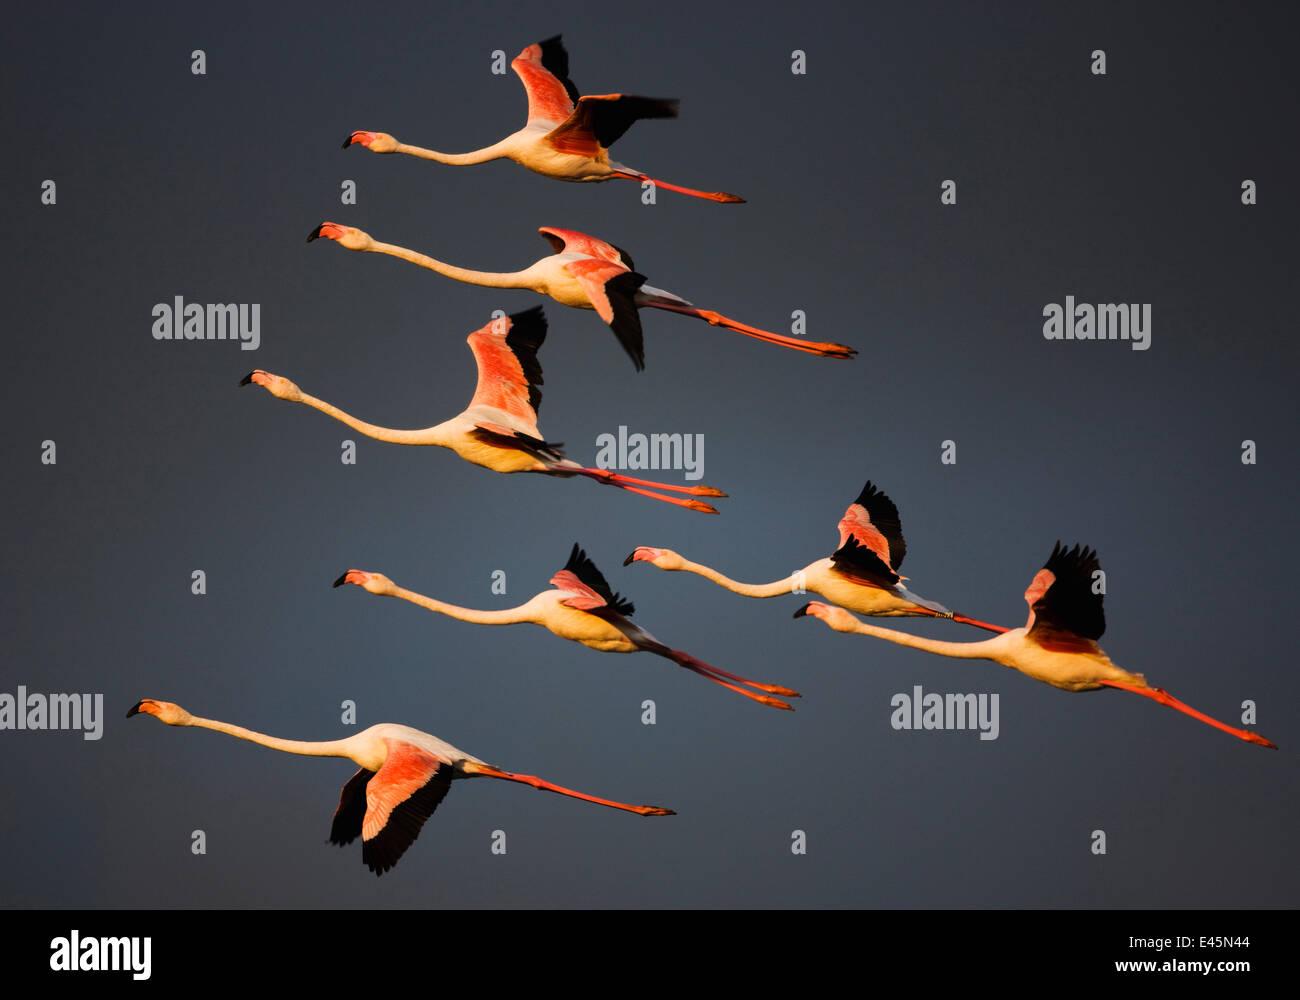 Greater flamingos (Phoenicopterus roseus) in flight, Camargue, France, April 2009. WWE INDOOR EXHIBITION - Stock Image